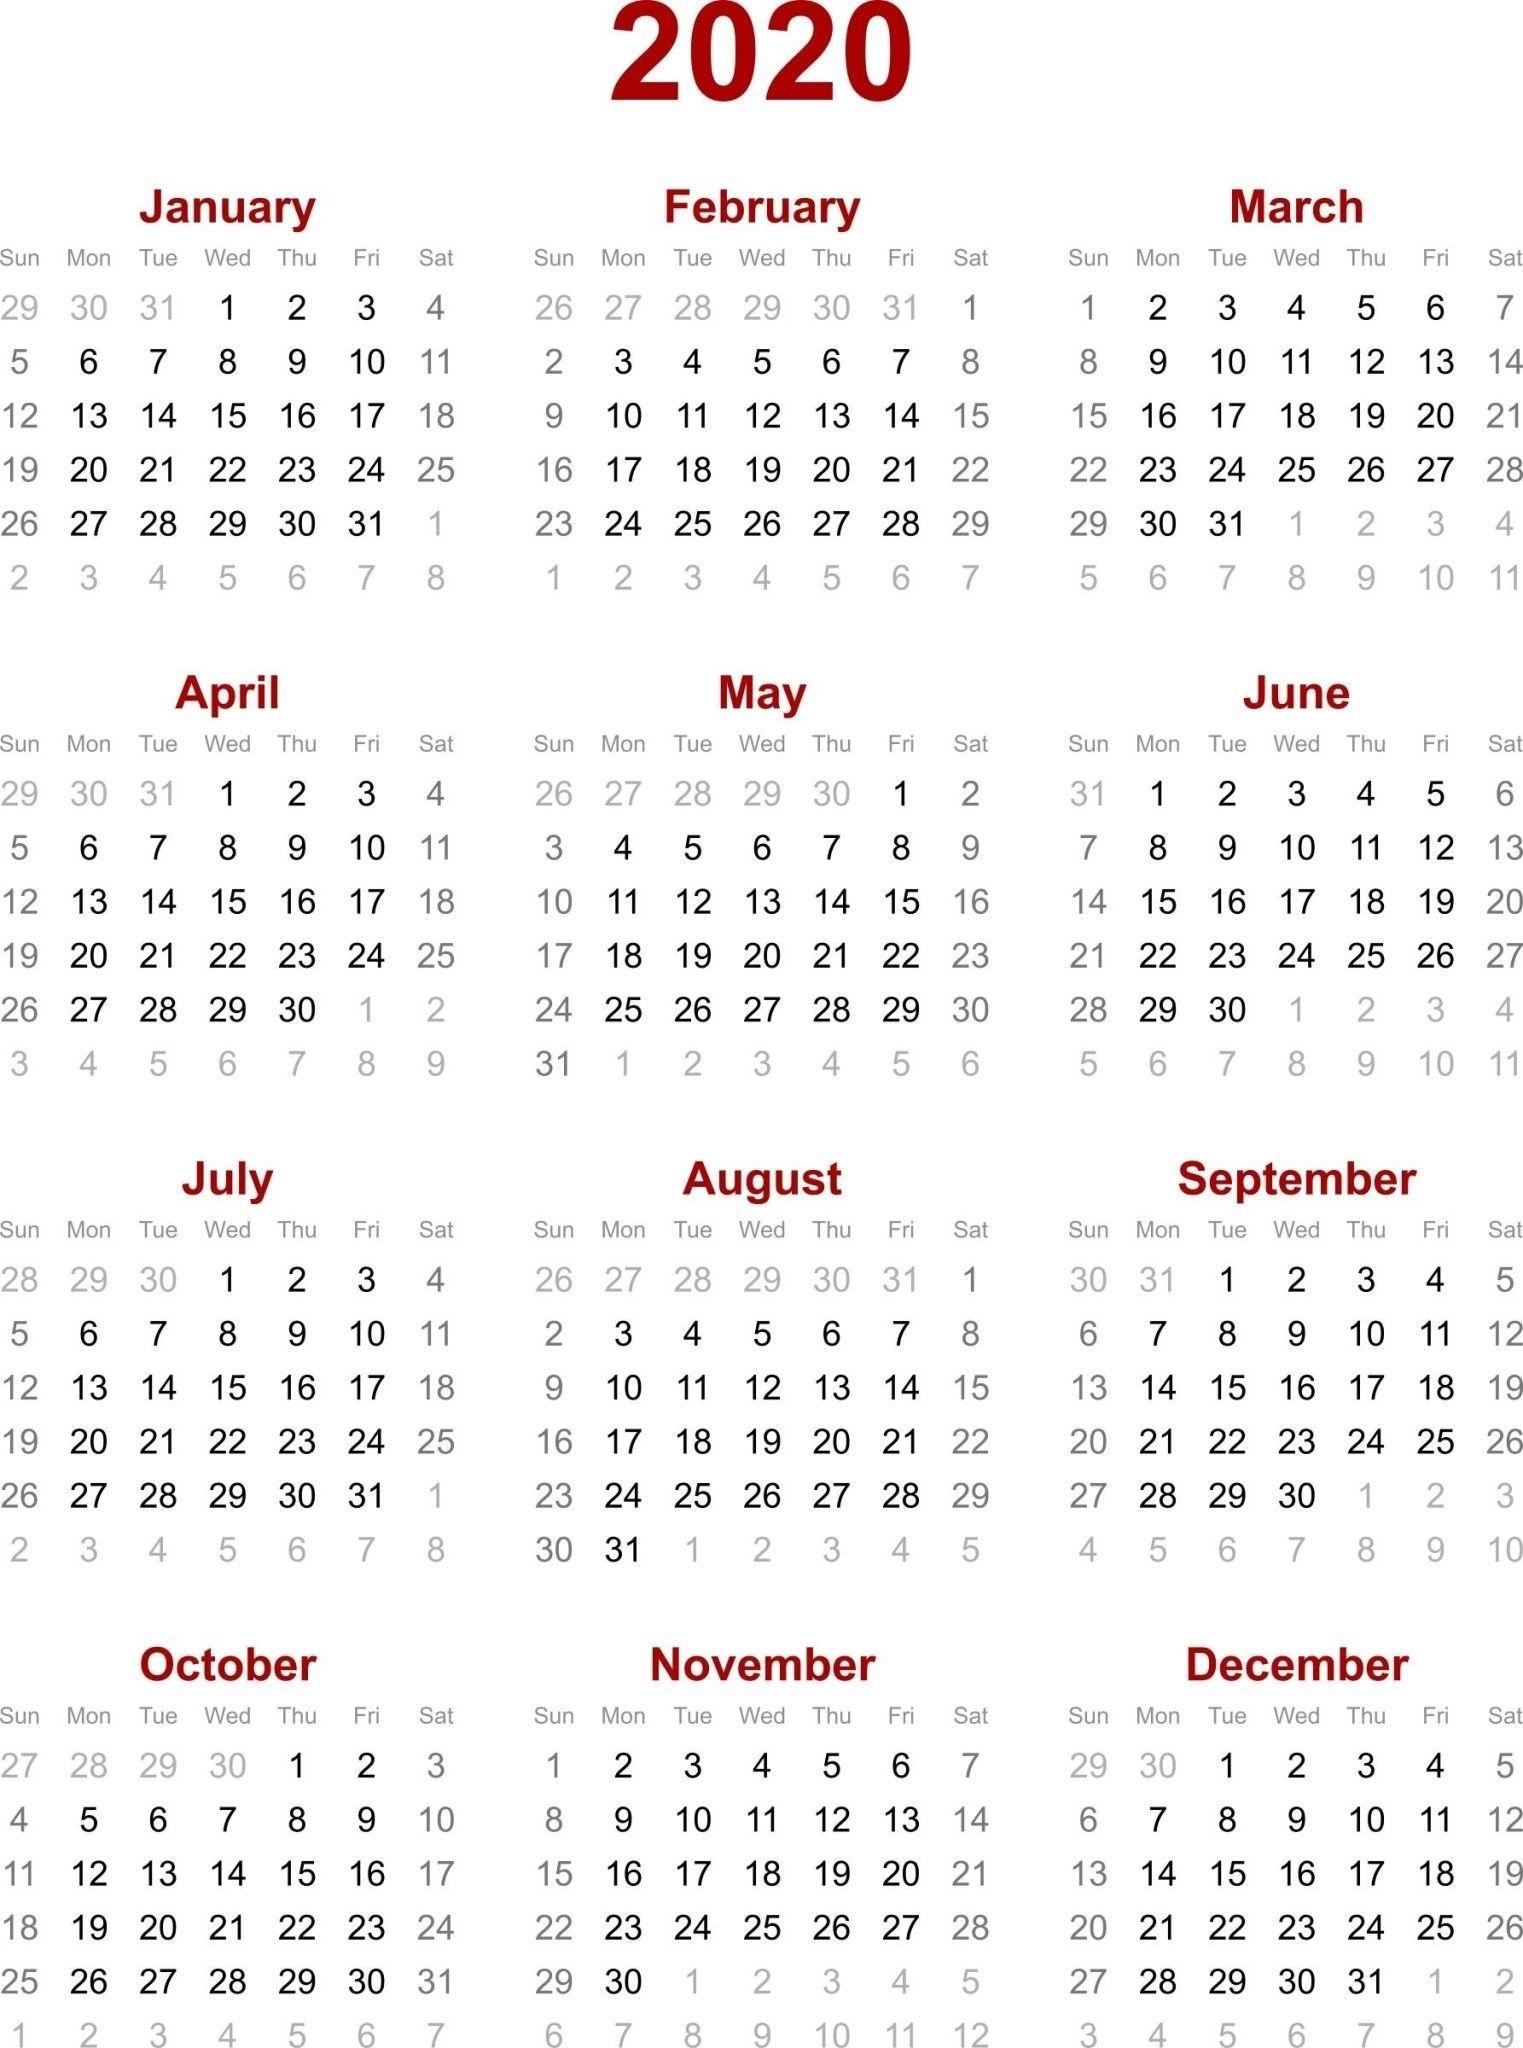 Chinese Calendar 2020 Printable Template   2020 Calendar Extraordinary 2020 Calendar With Jewish Holidays Pdf